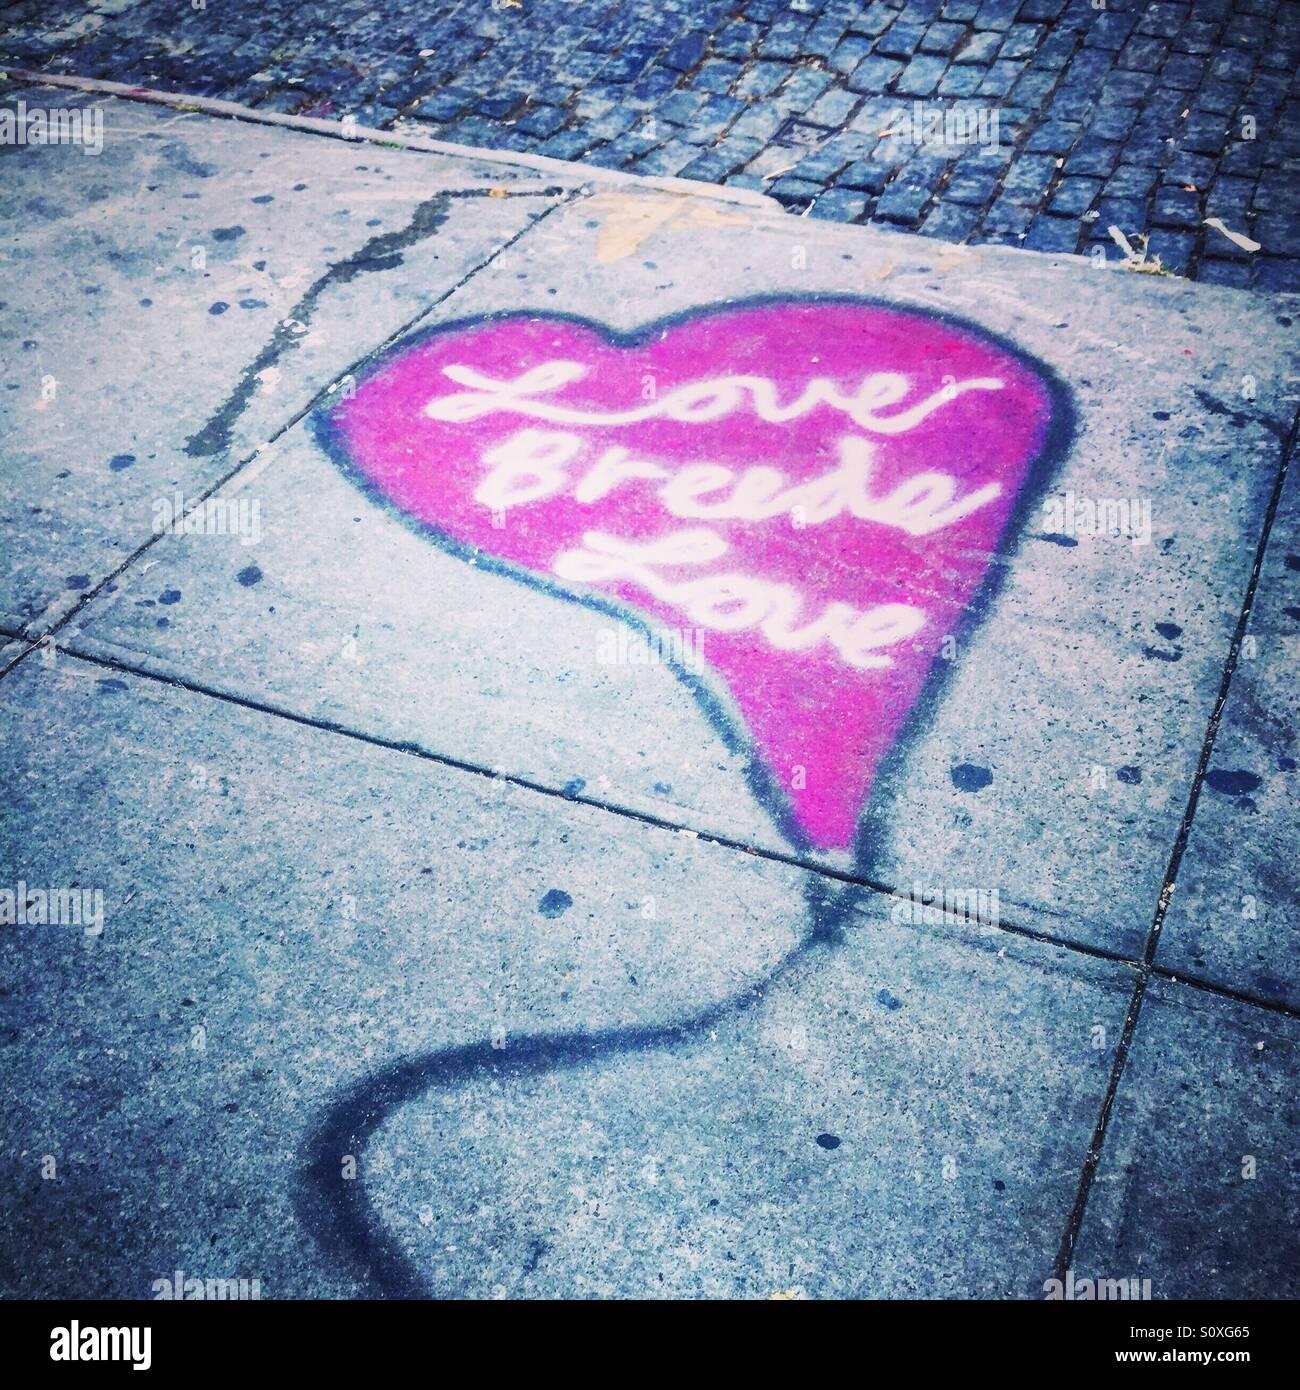 Love breeds love graffiti street art on pavement - Stock Image